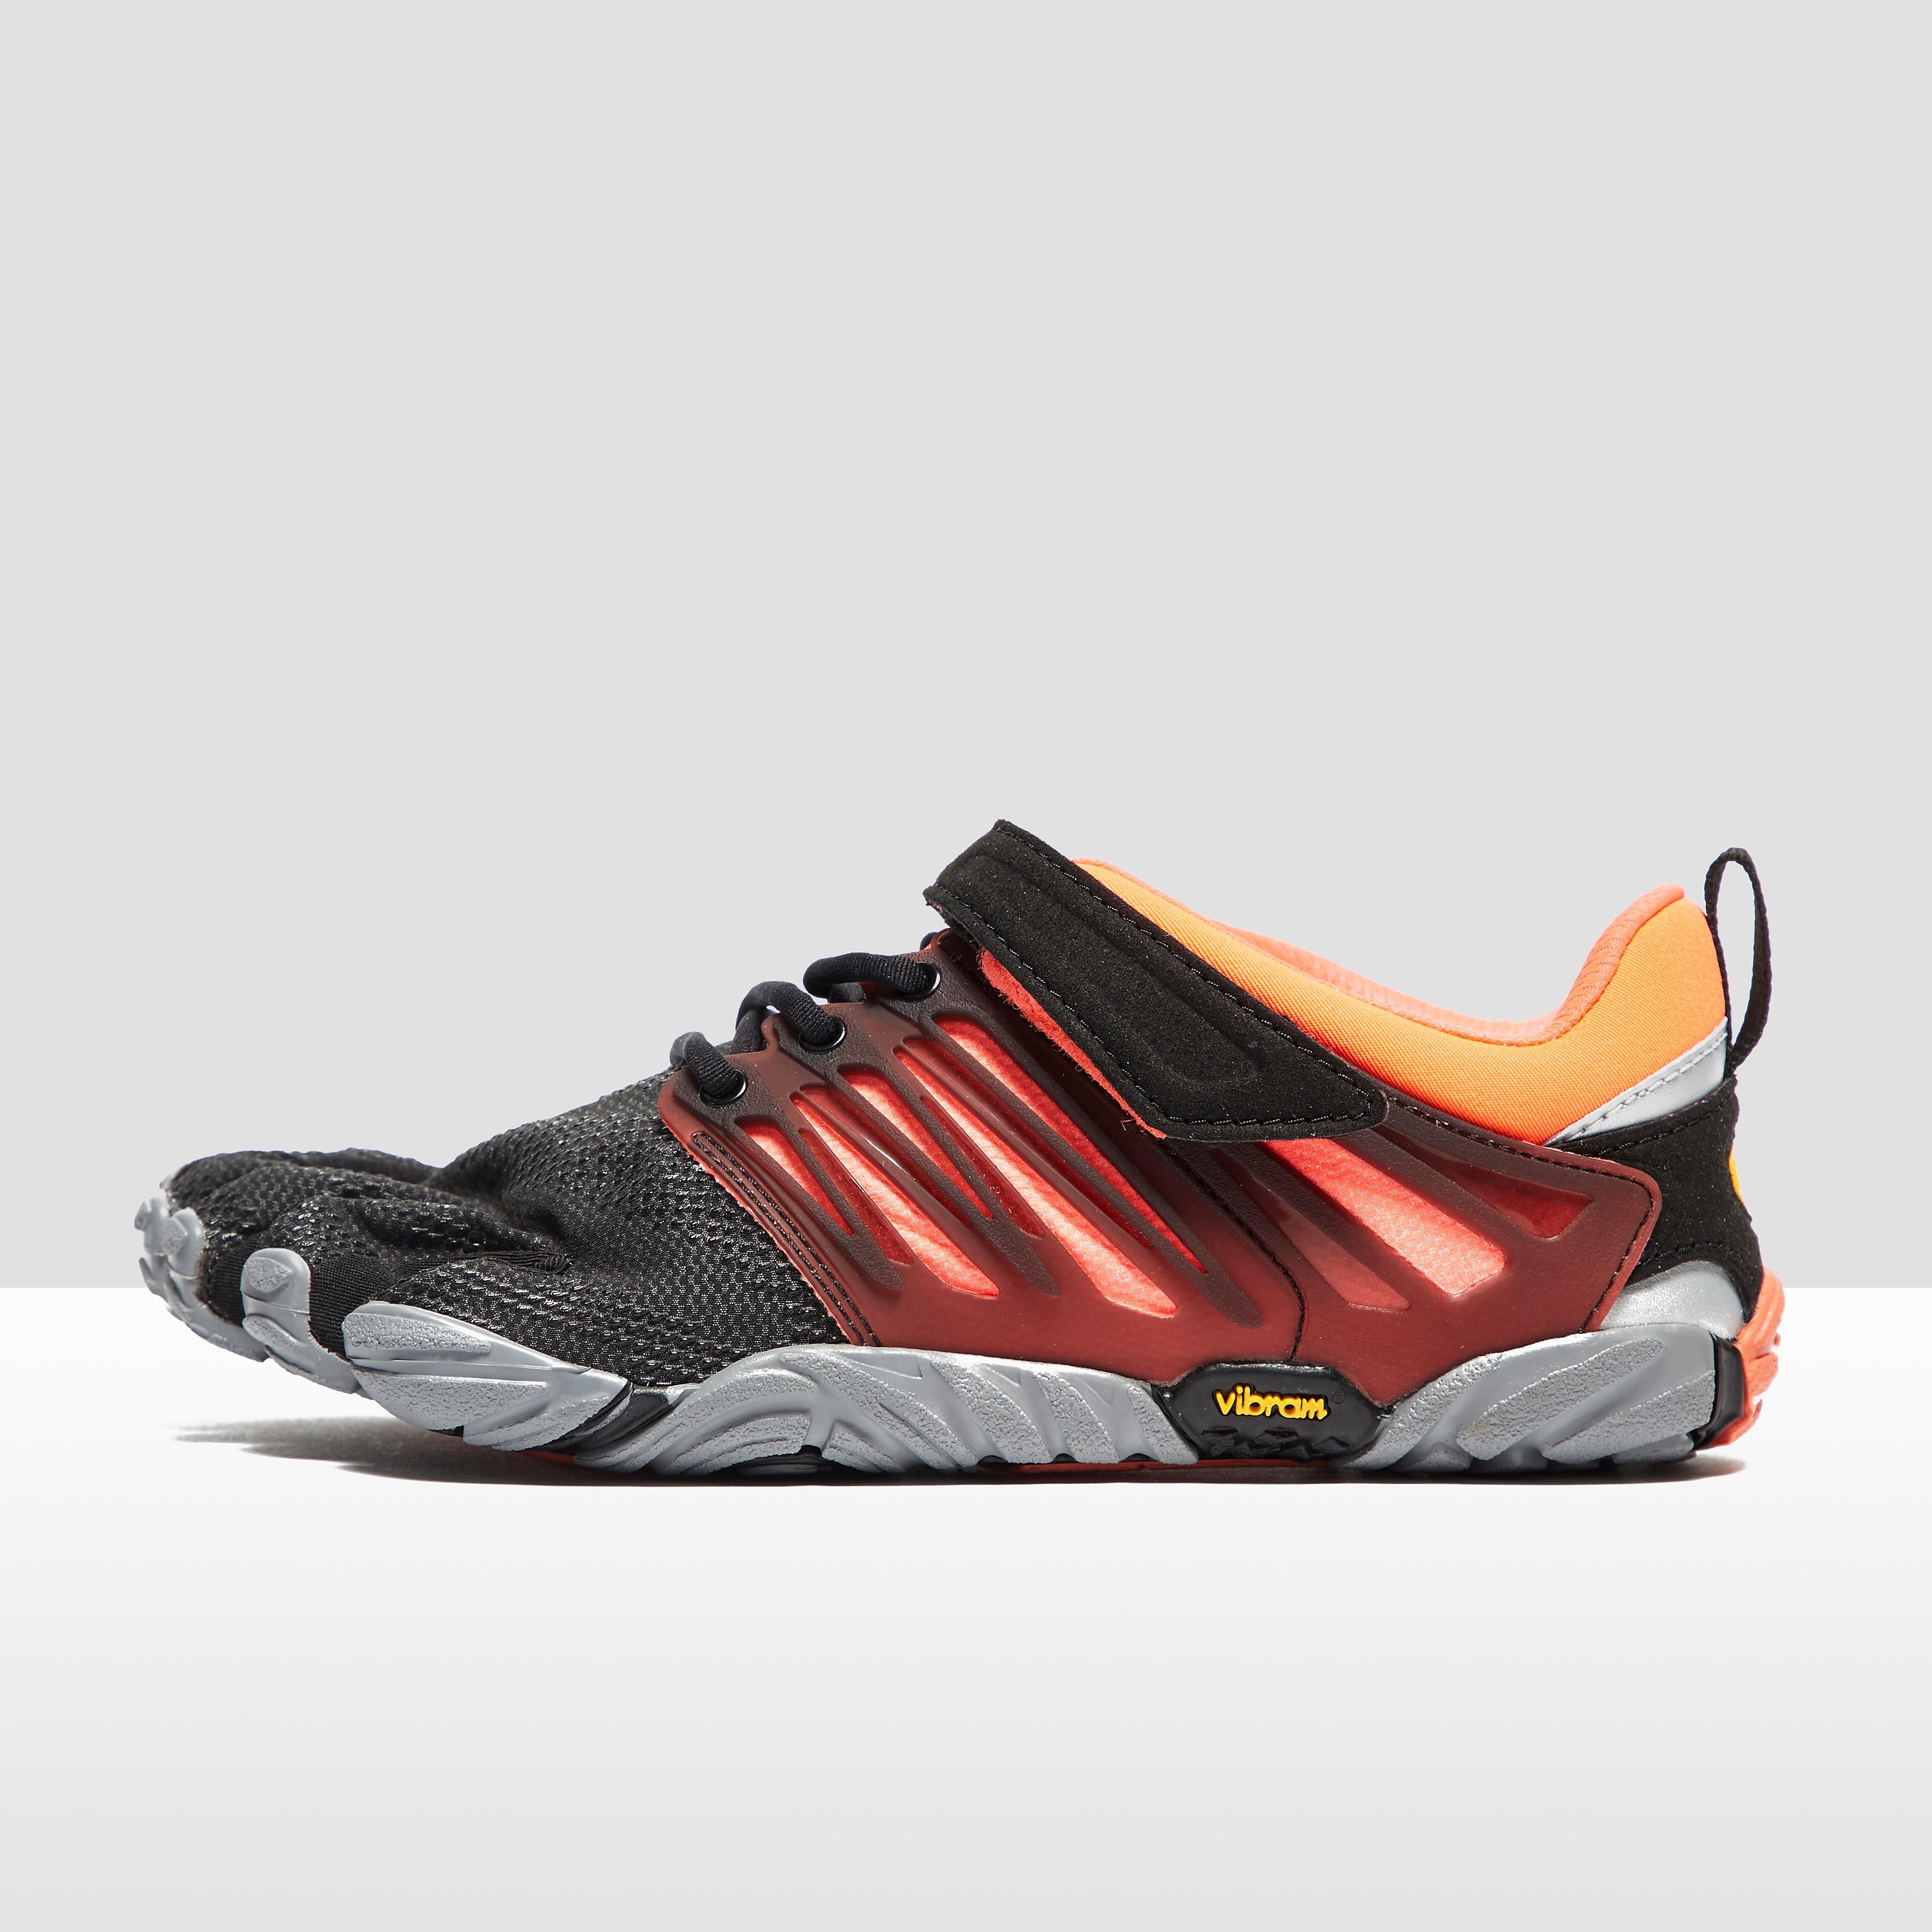 Vibram Five Fingers V-Train Women's Training Shoes